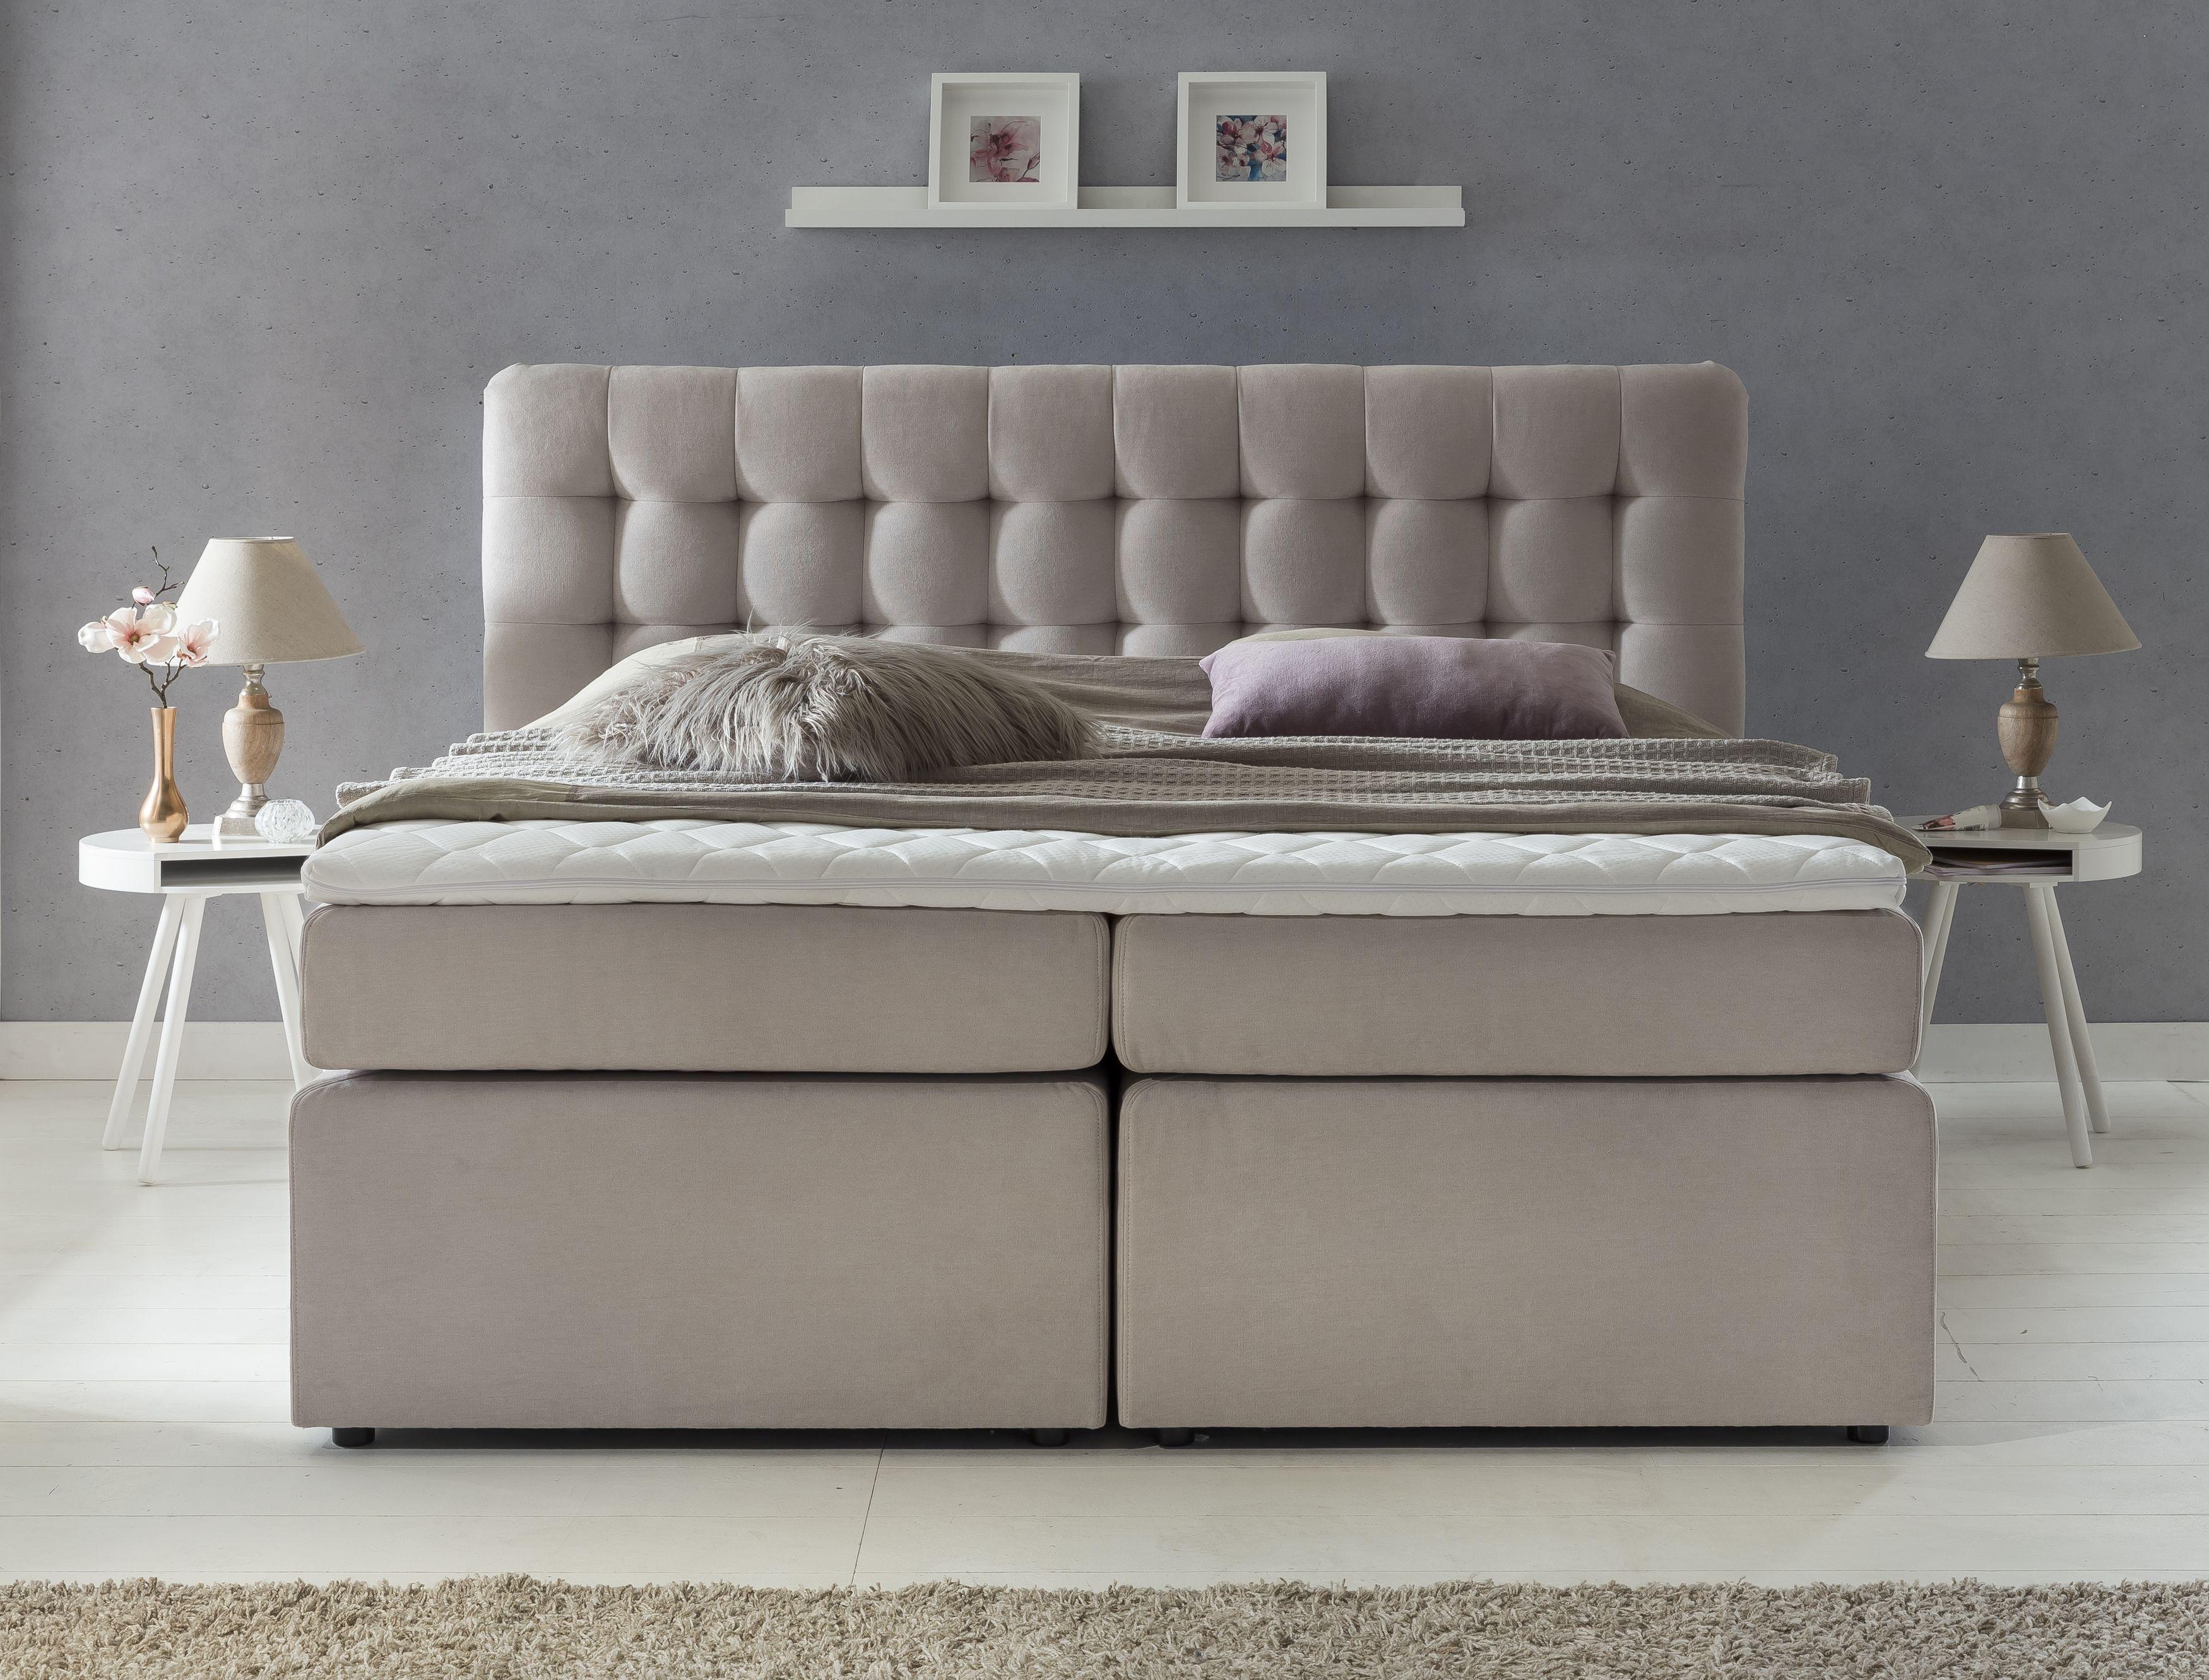 Ma Belfreude 5 Boxspringbetten Online Kaufen Boxspringbett Boxspringbetten Kaufen Mabelfreude Online In 2020 Box Spring Bed Bed Modern Bed